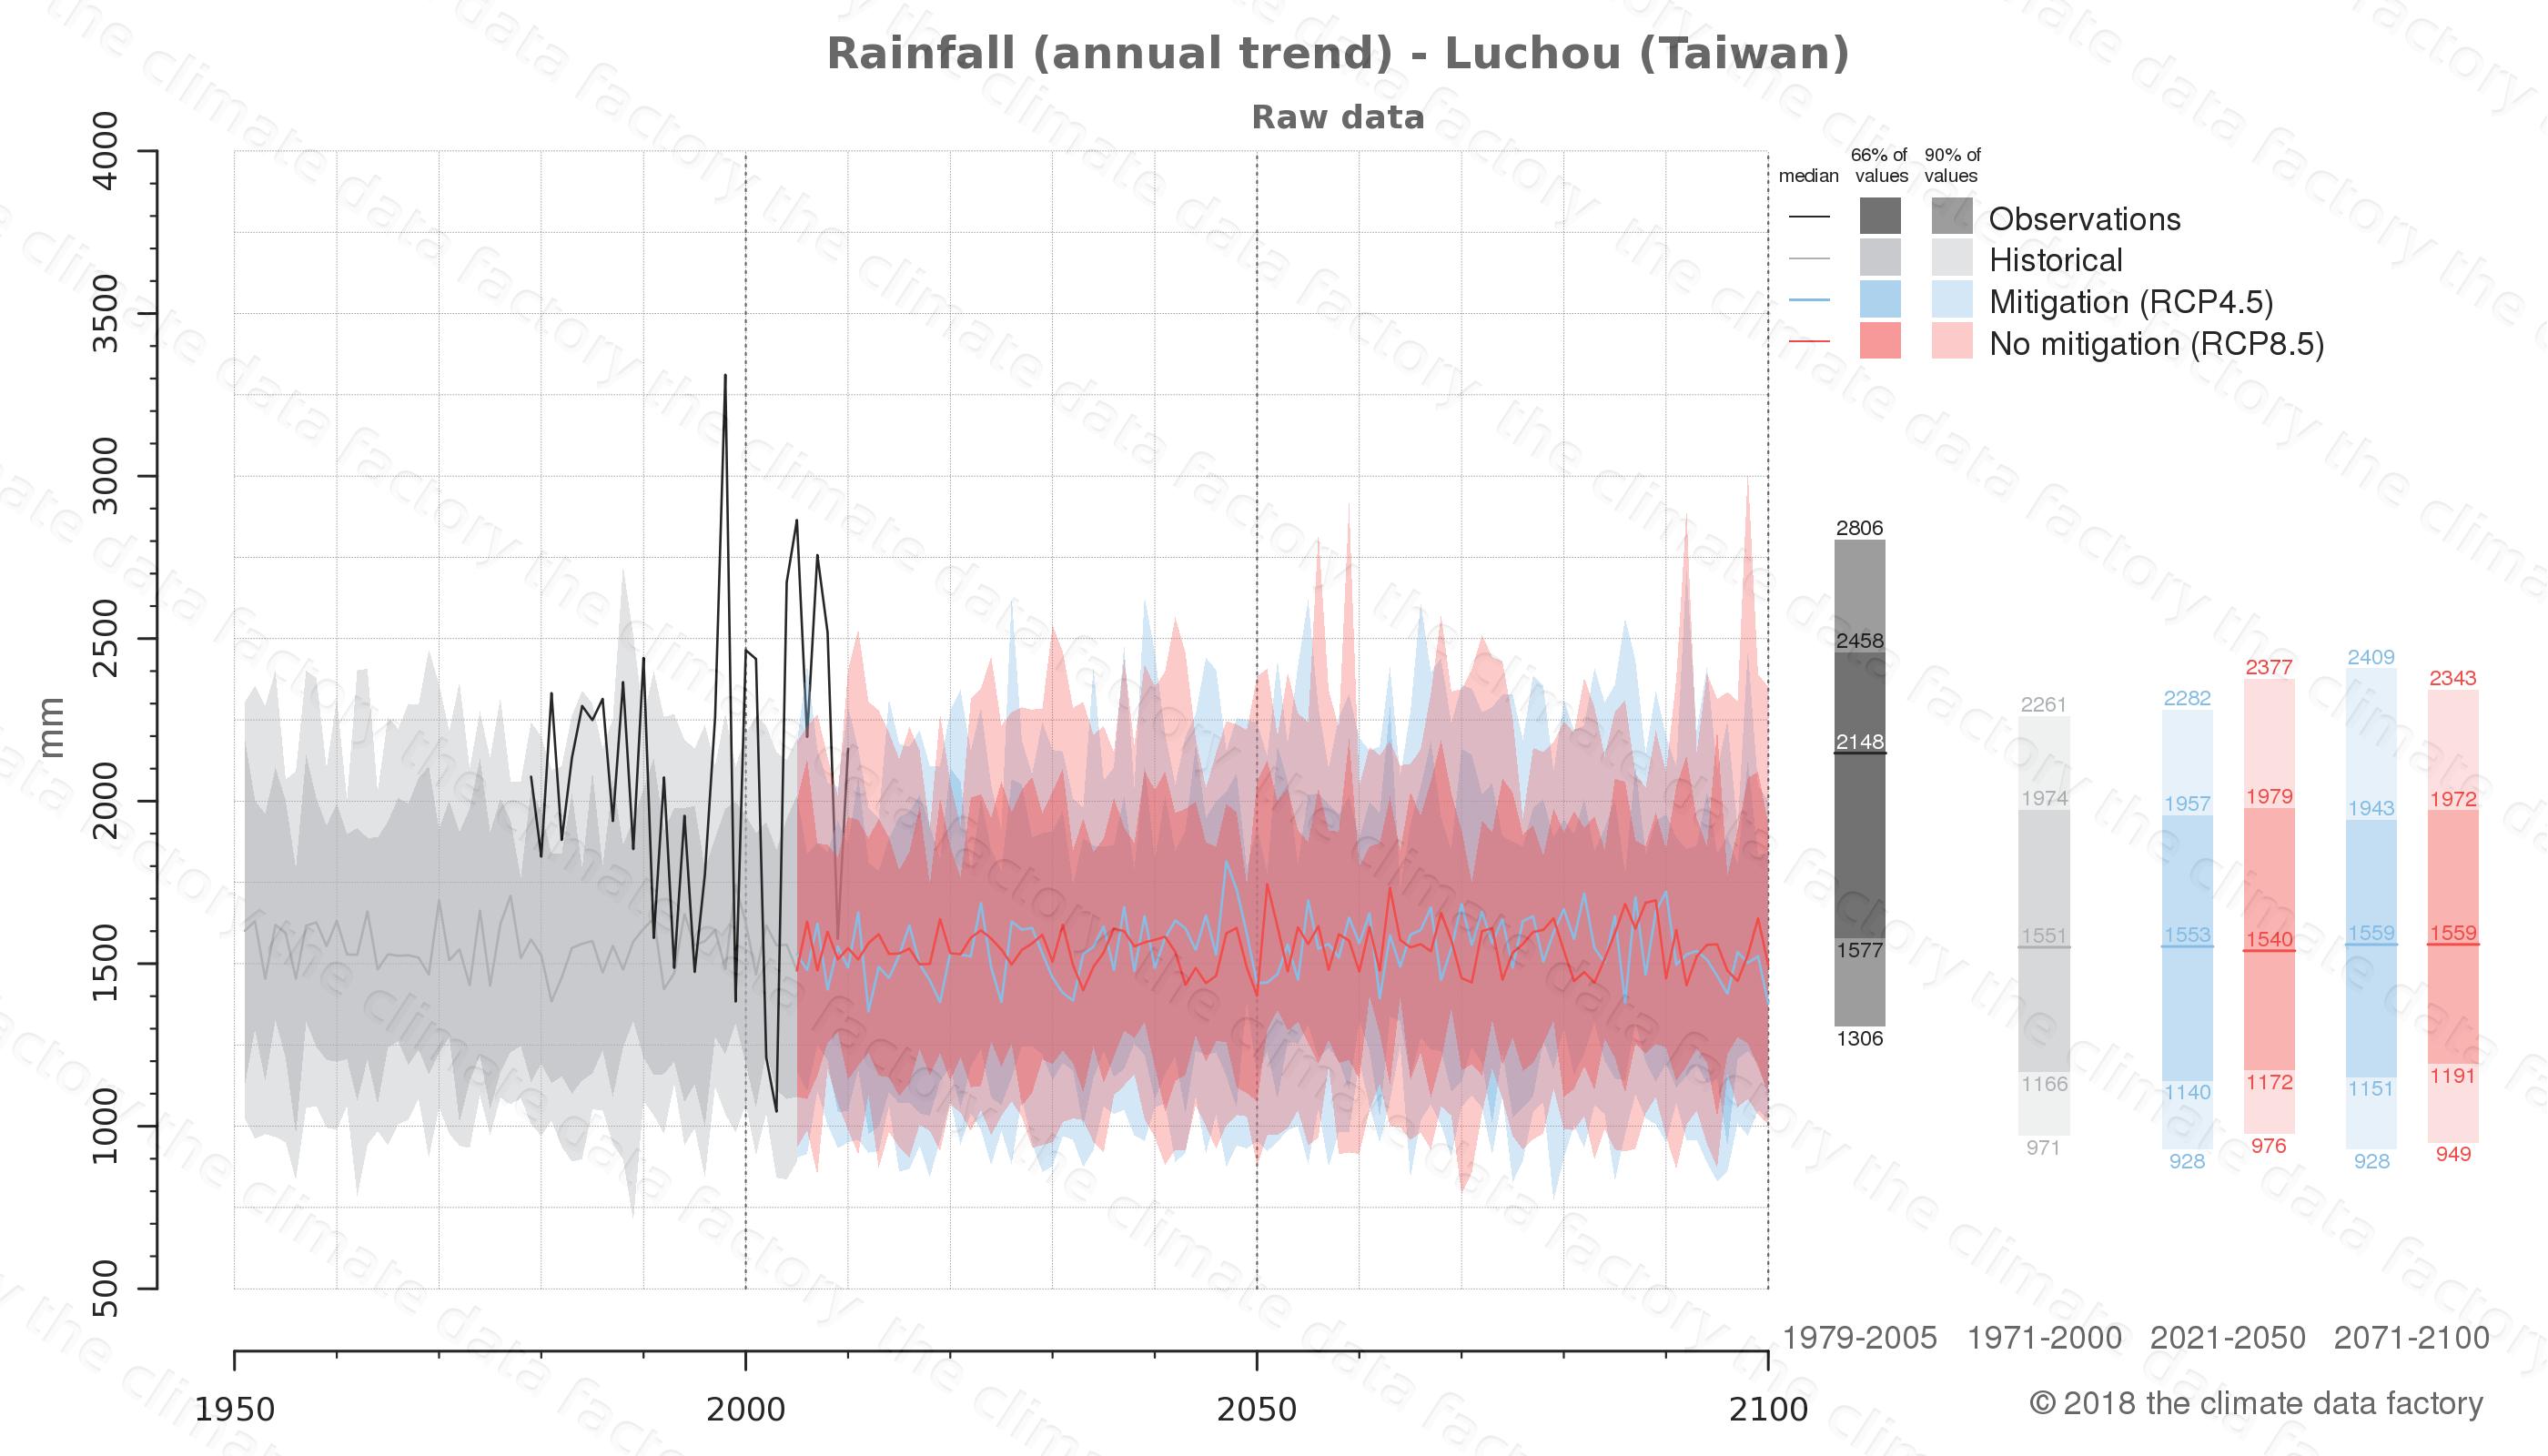 climate change data policy adaptation climate graph city data rainfall luchou taiwan